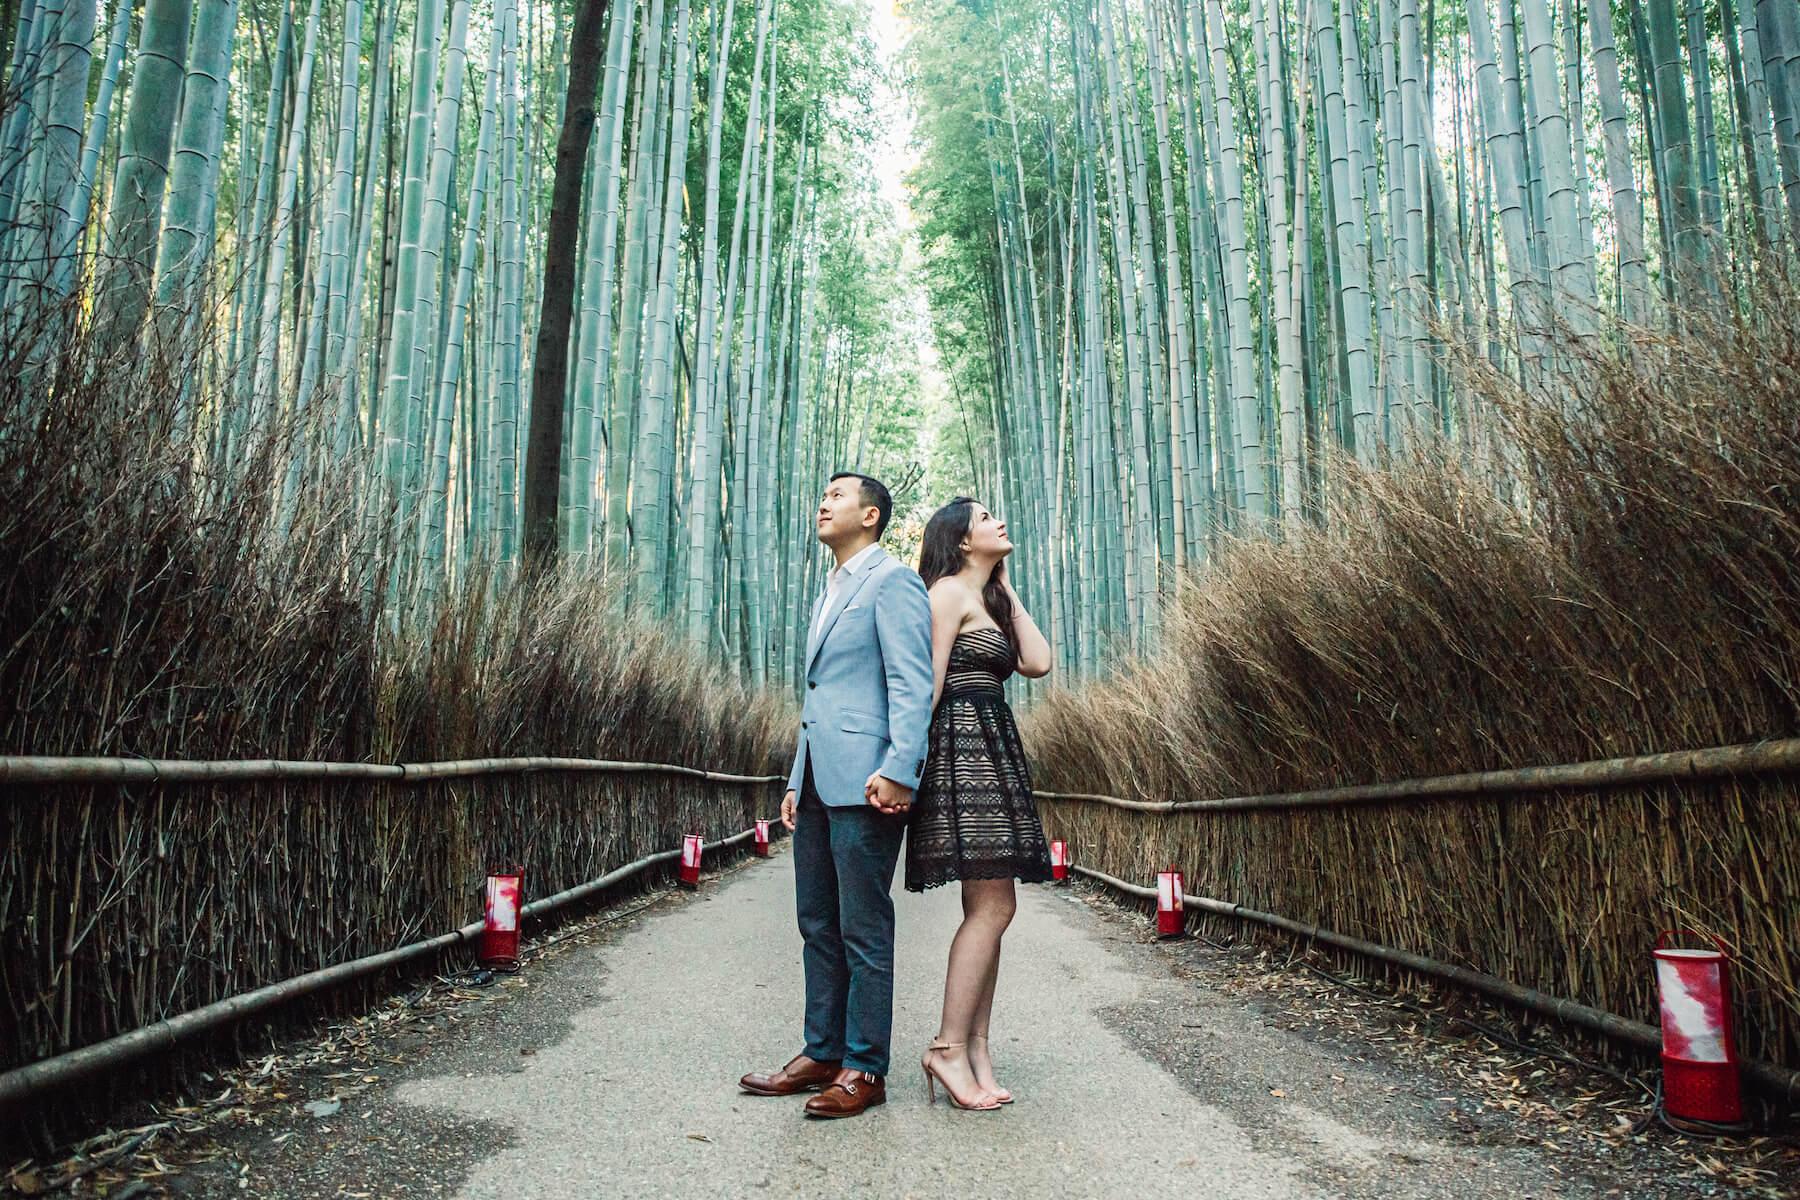 kyoto-12-19-2019-proposal-38_original